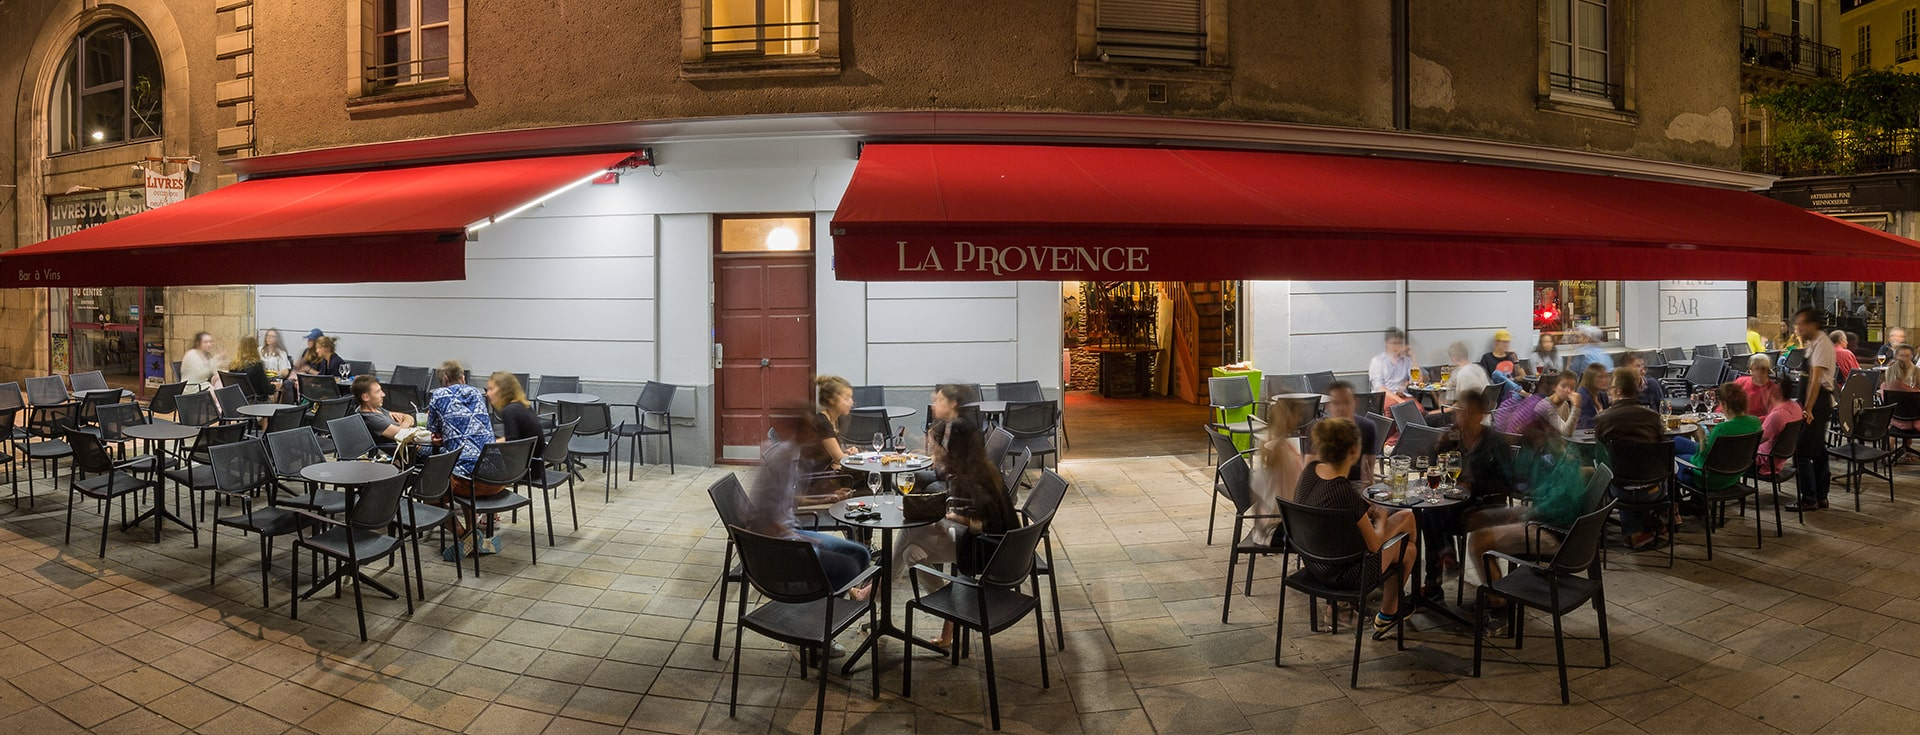 Store Banne Madrid - Bar La Provence à Nantes (44) par Espacio